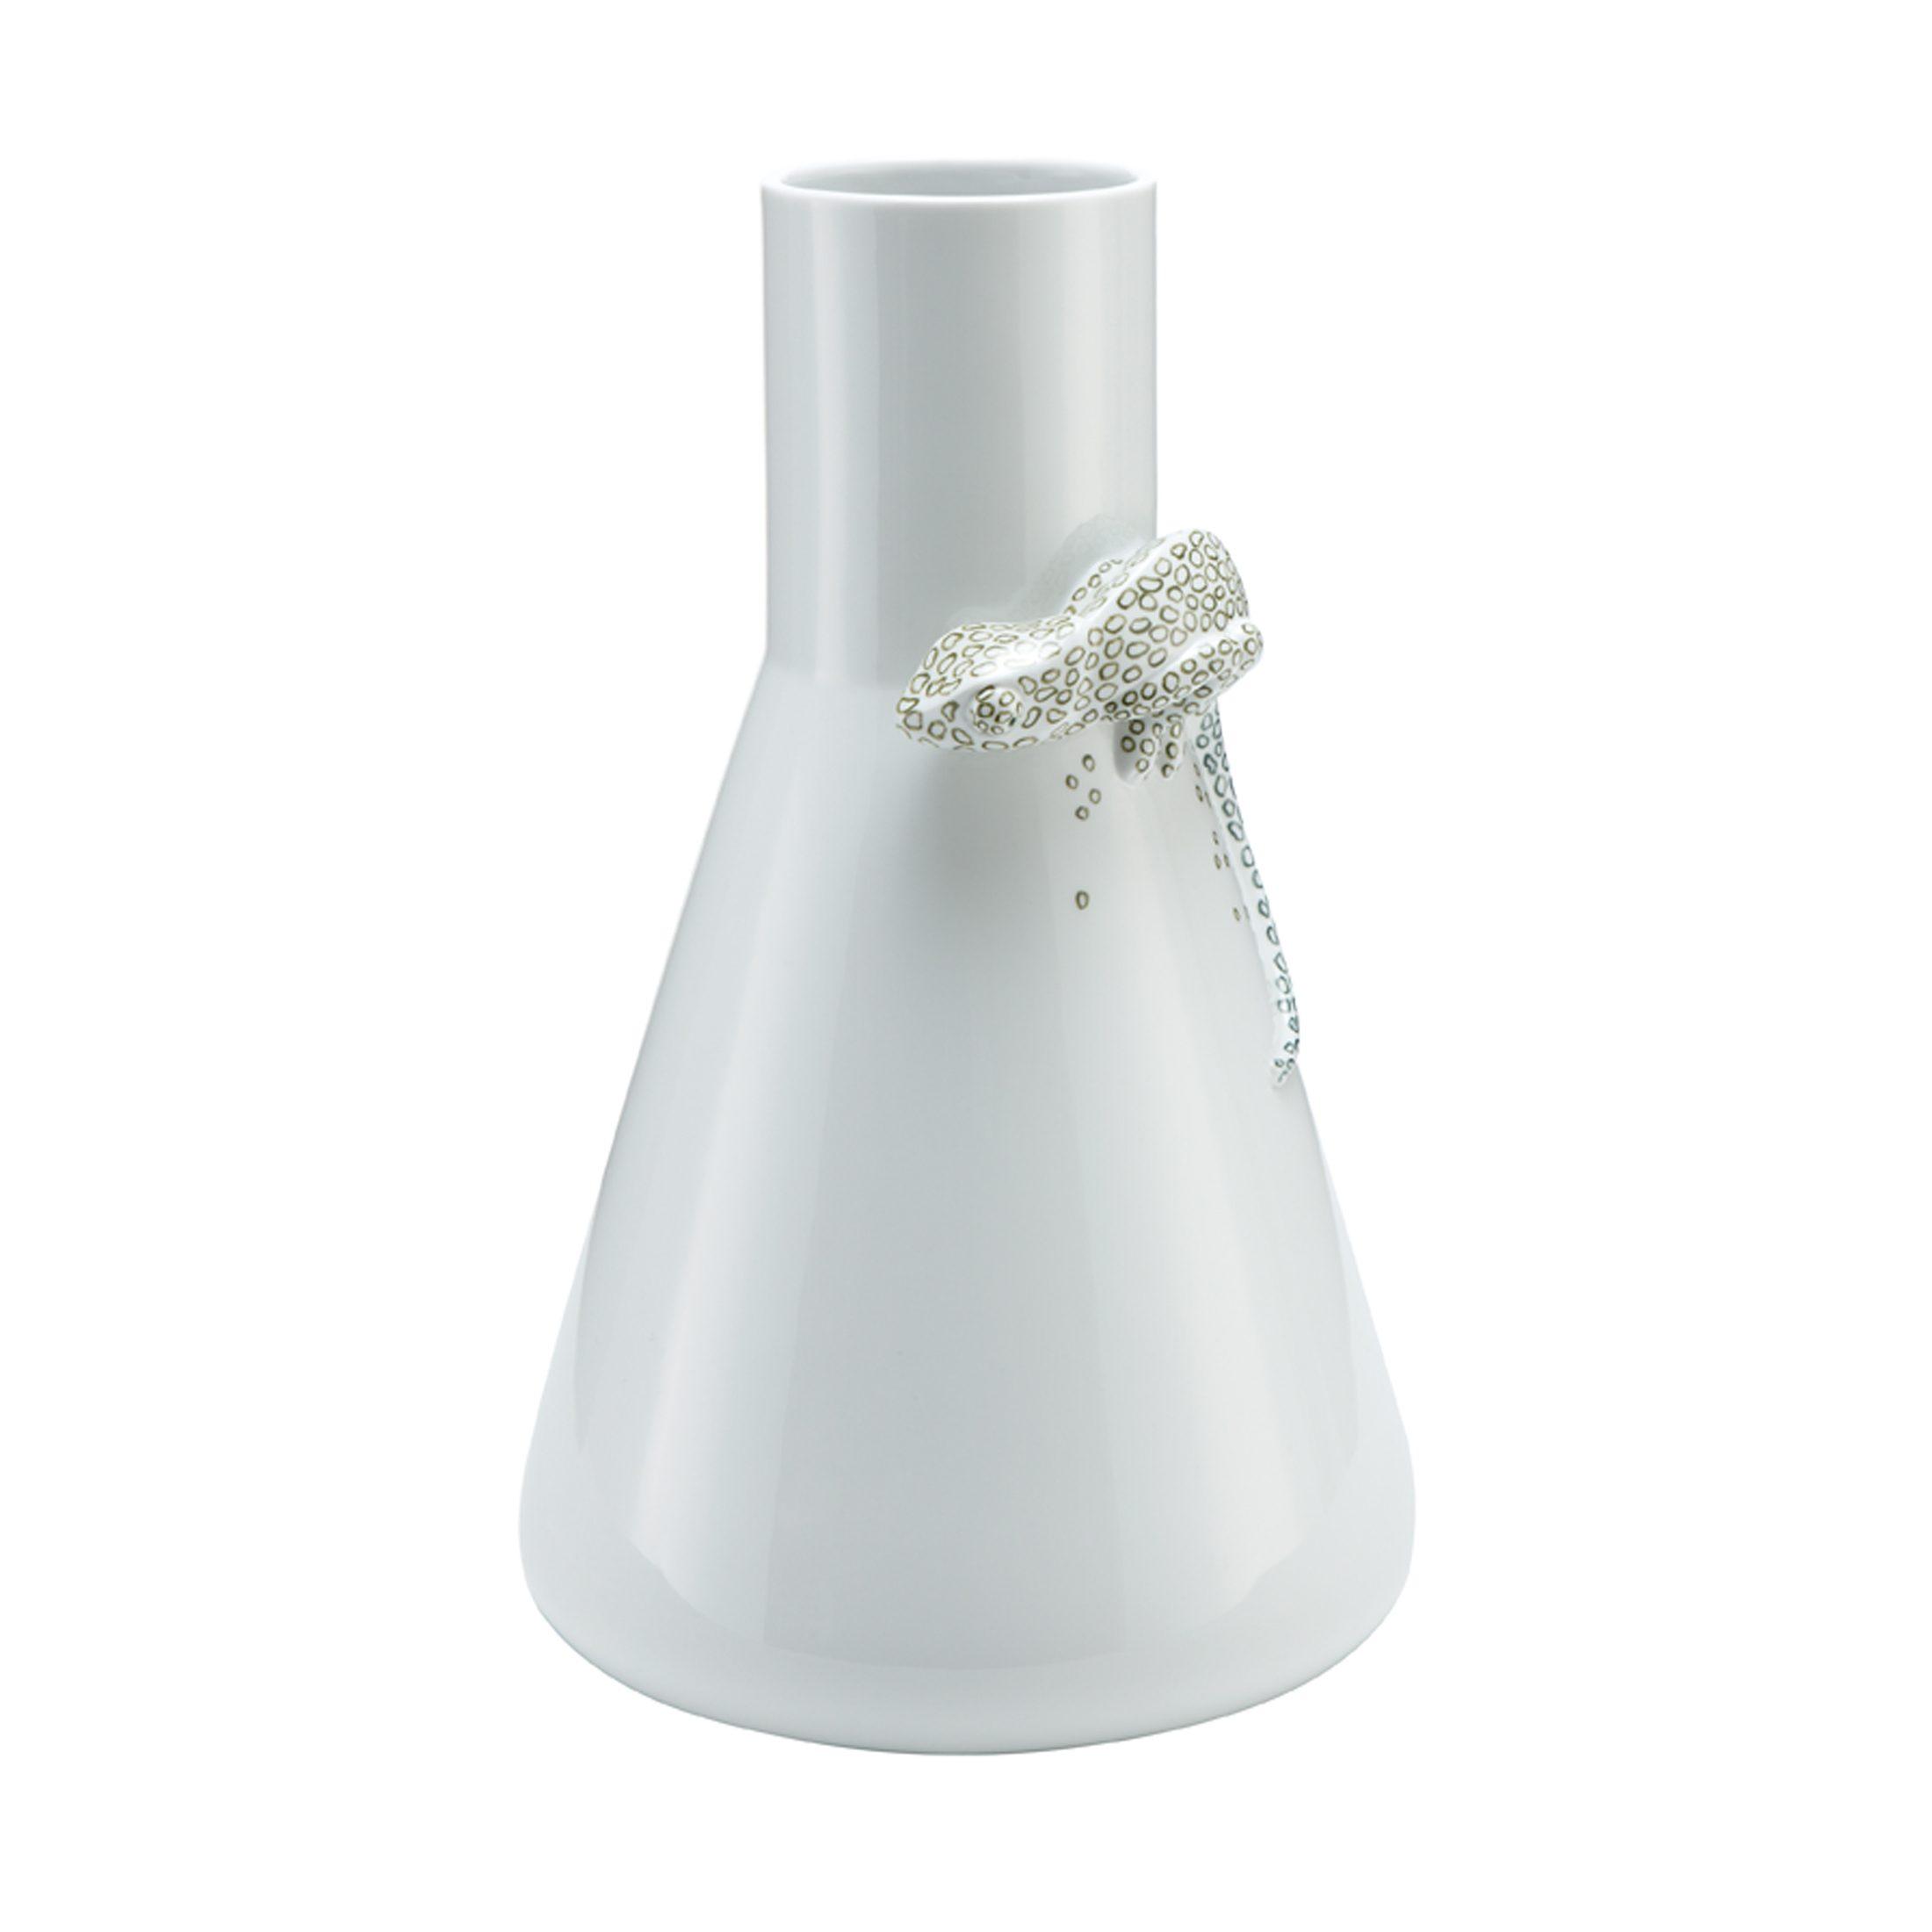 Goebel Chamouflage Vase »Uta Koloczek«